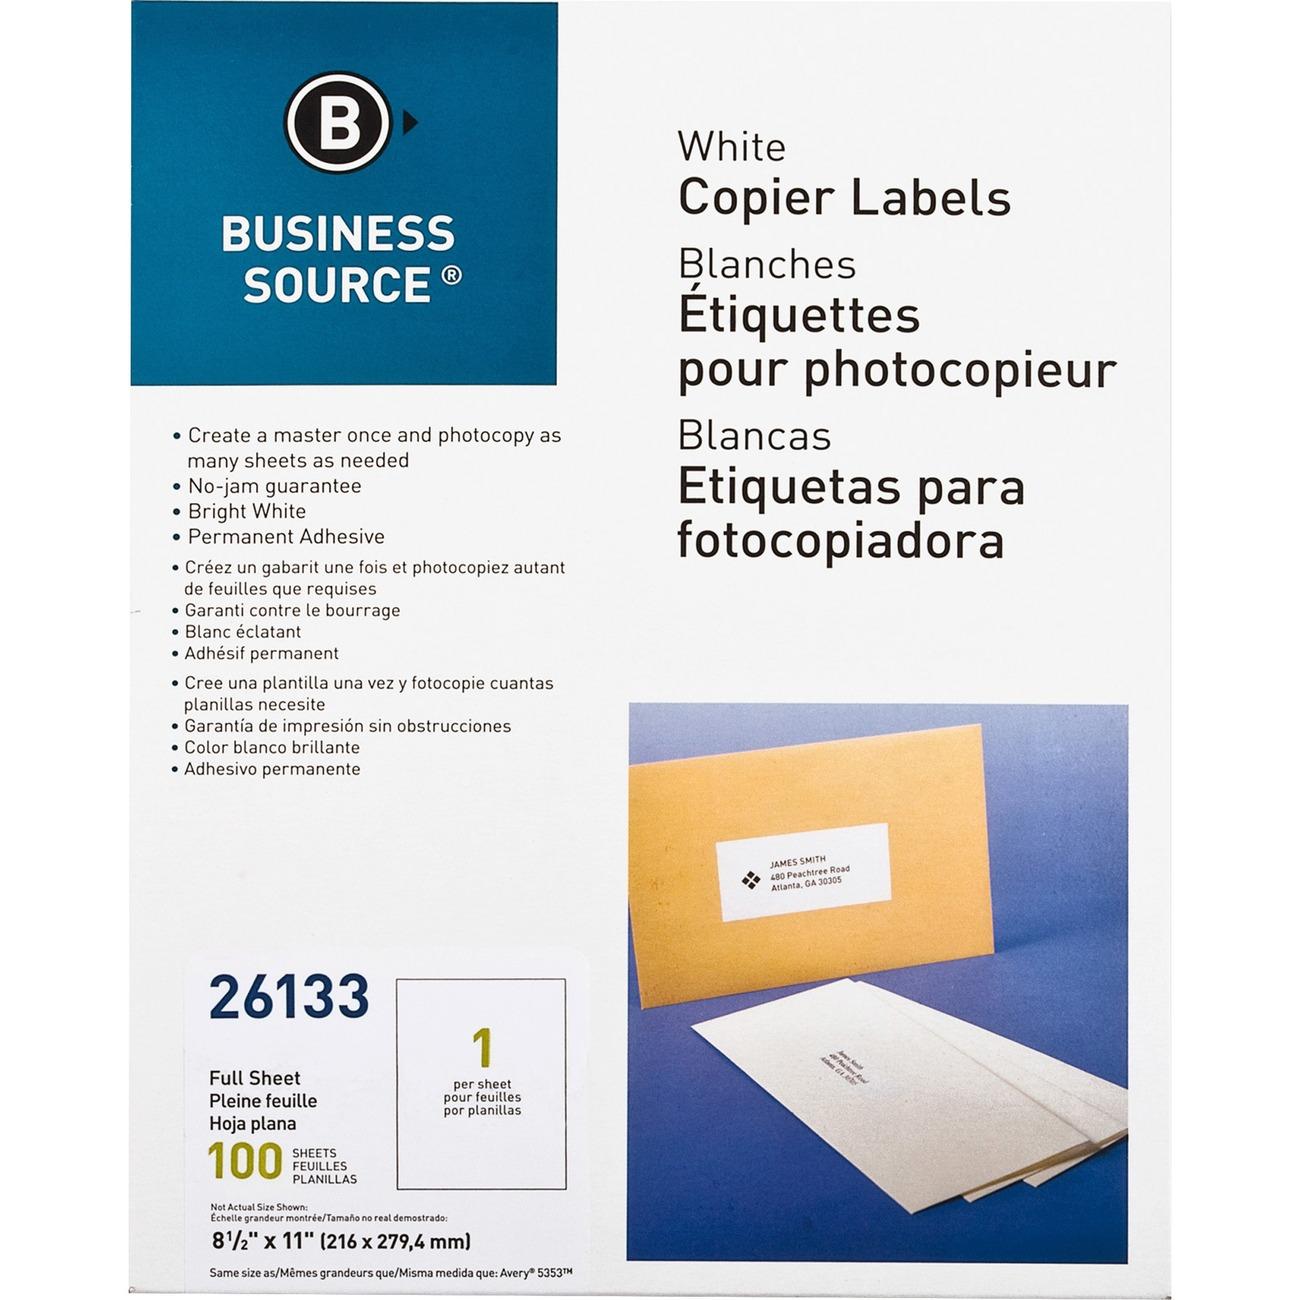 Premium White Copier Mailing Labels Full Sheet